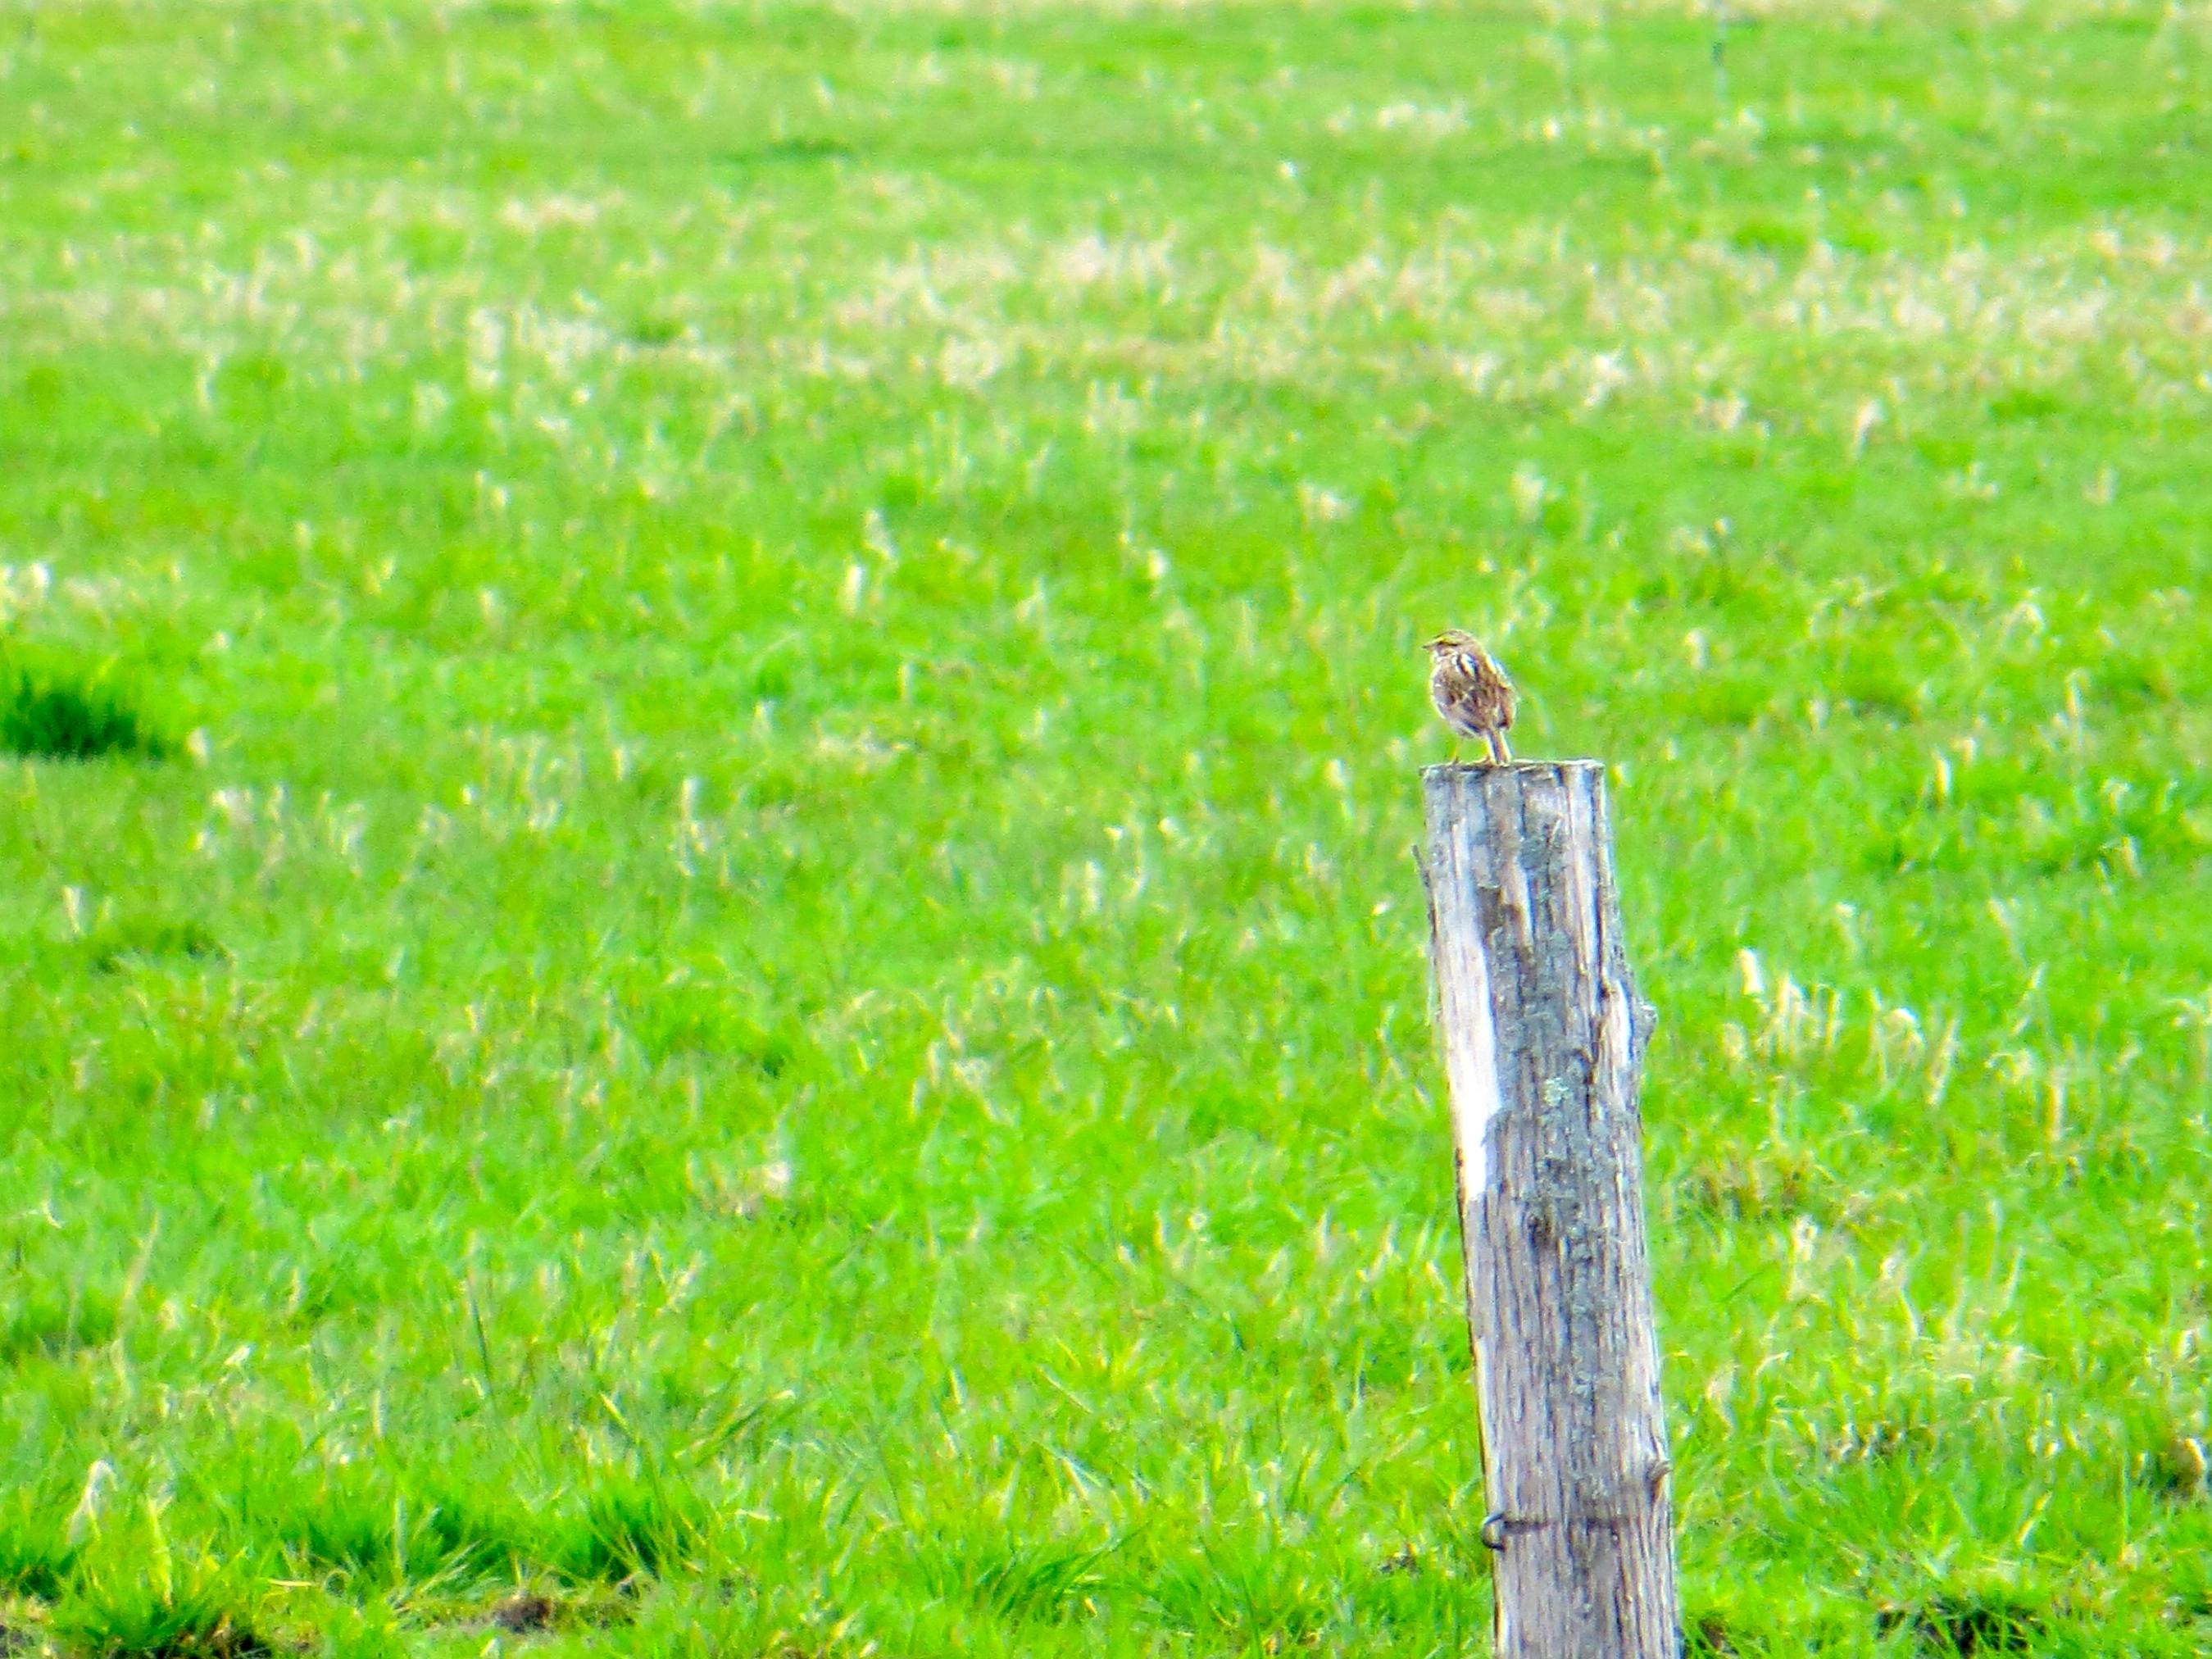 Savannah Sparrow enjoying the spring day